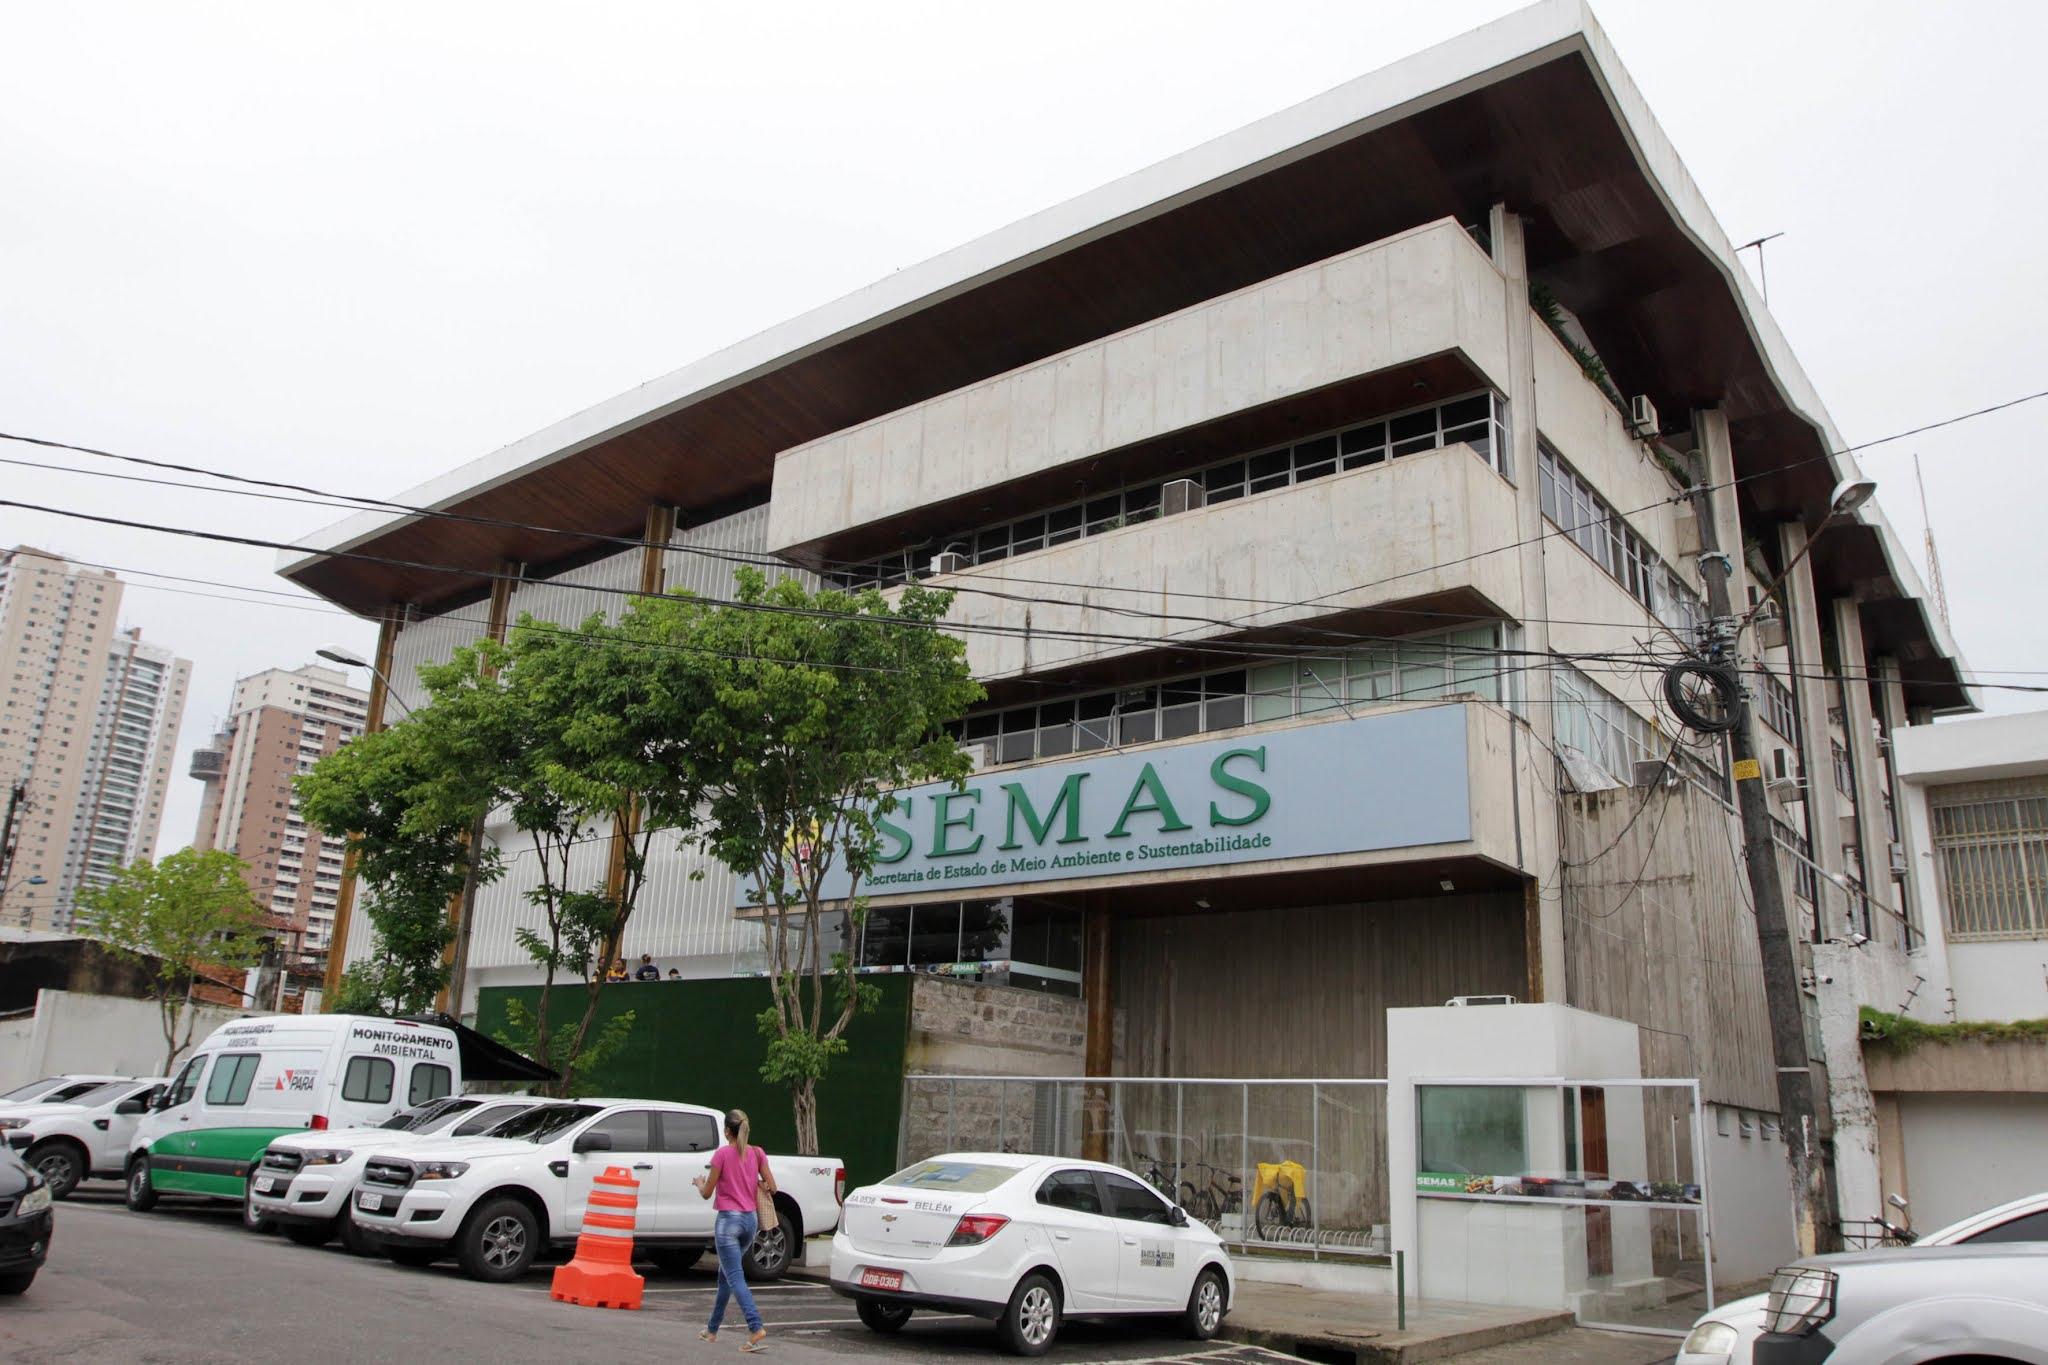 Meio Ambiente do PA doa madeira para Juruti; prefeita vai construir pontes